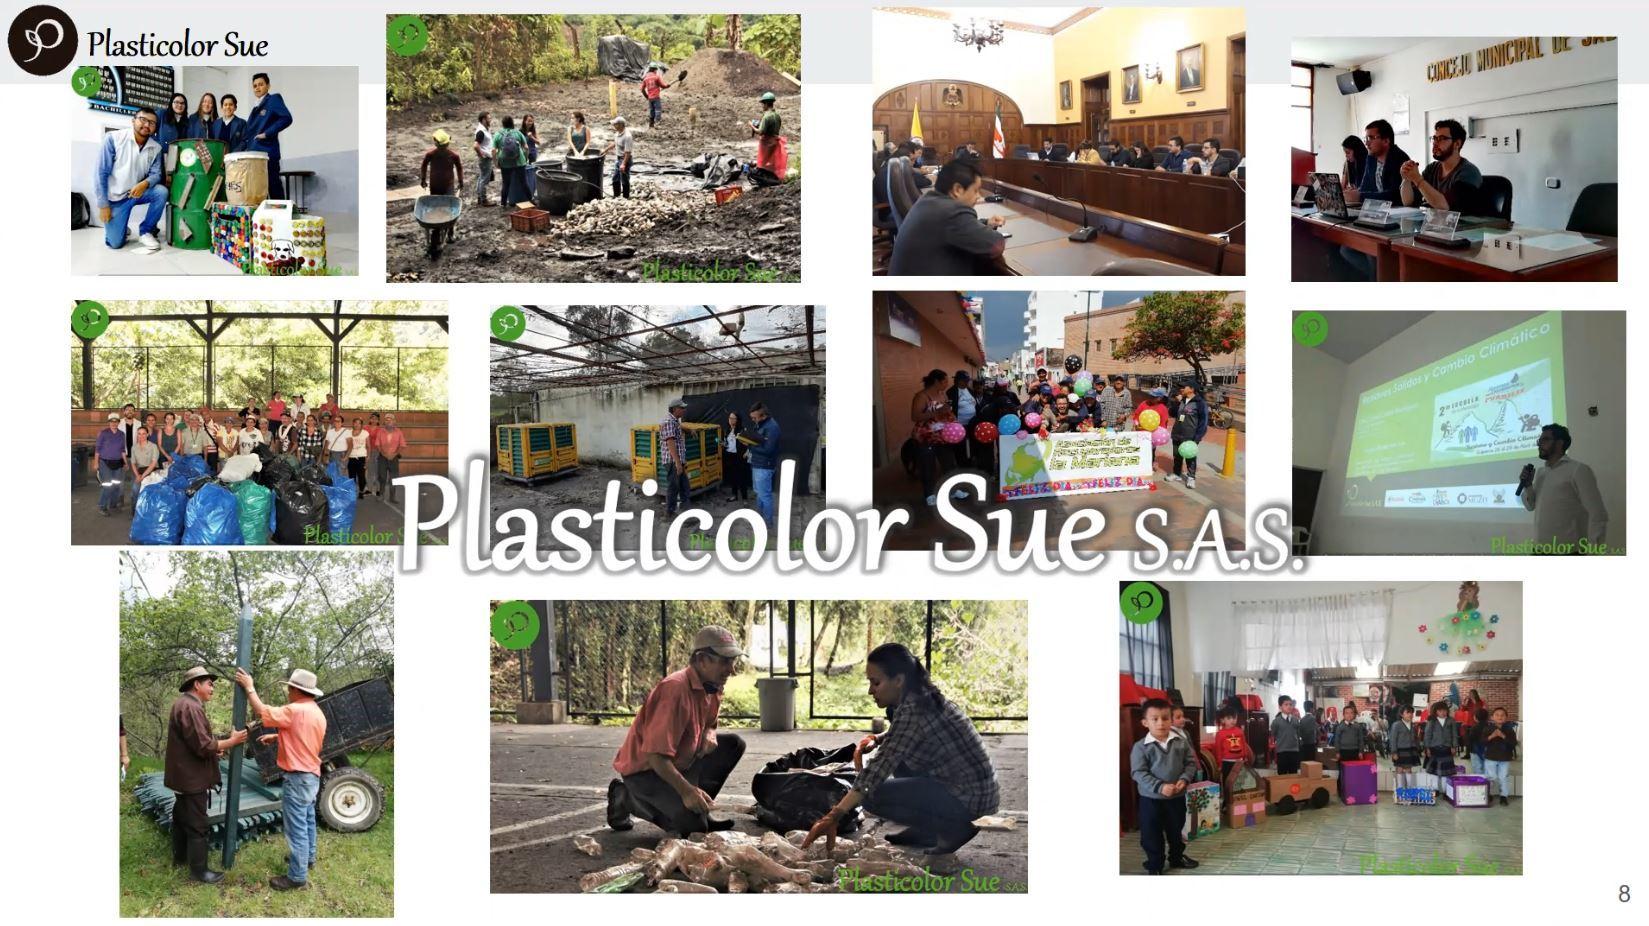 PLASTICOLOR SUE- Alliances for a Circular Economy / PLASTICOLOR SUE- Alianzas para una Economía Circular